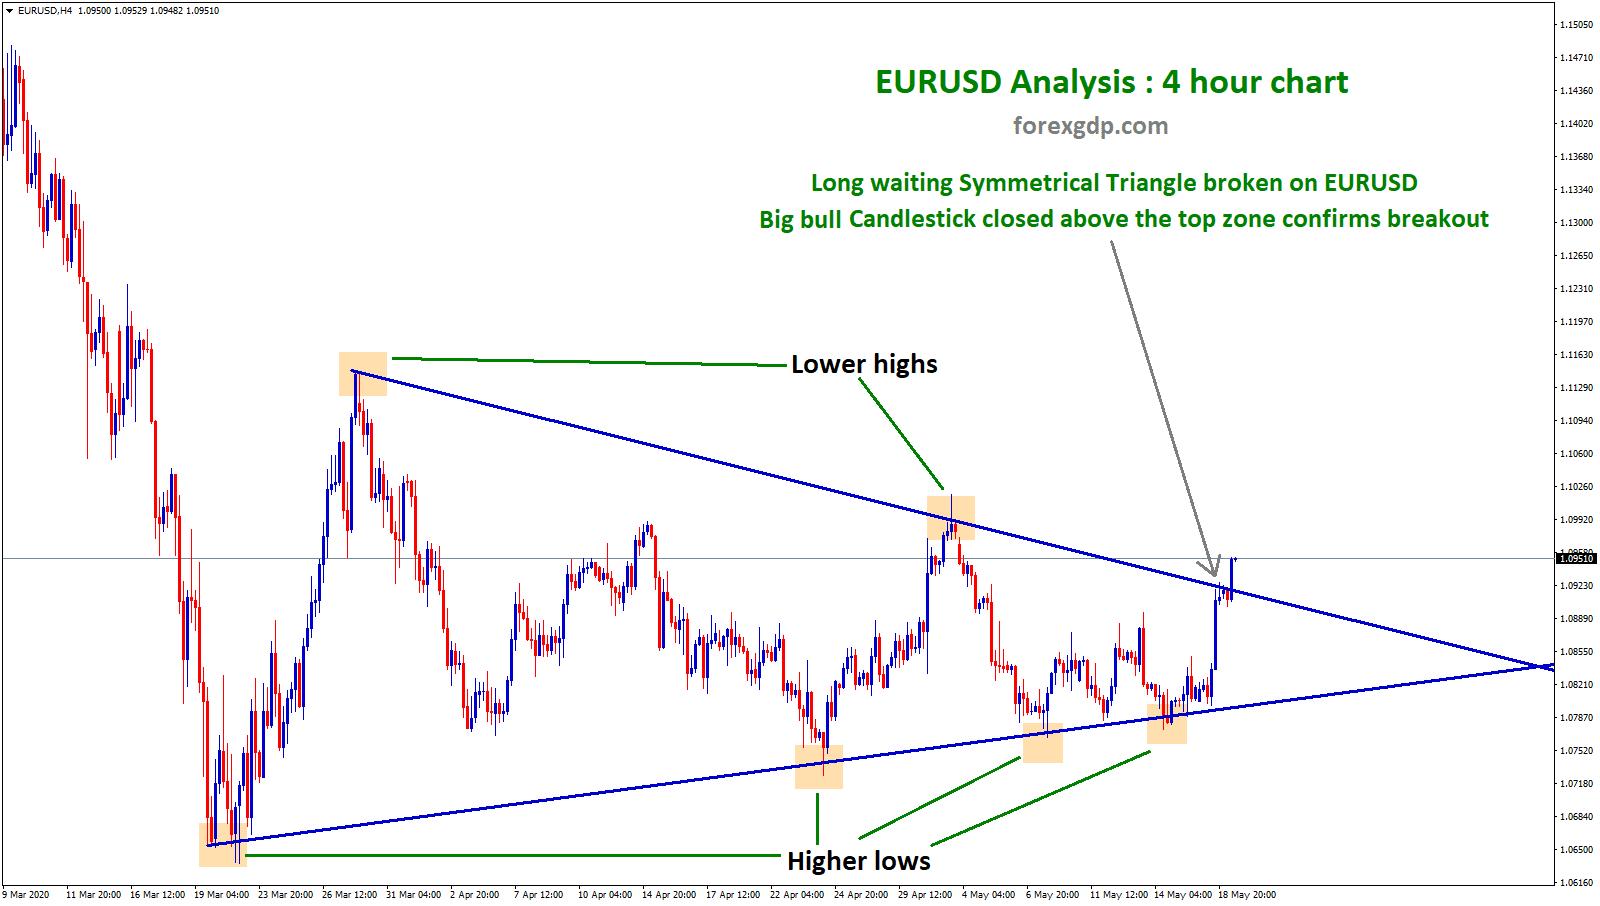 EURUSD Symmetrical triangle breakout